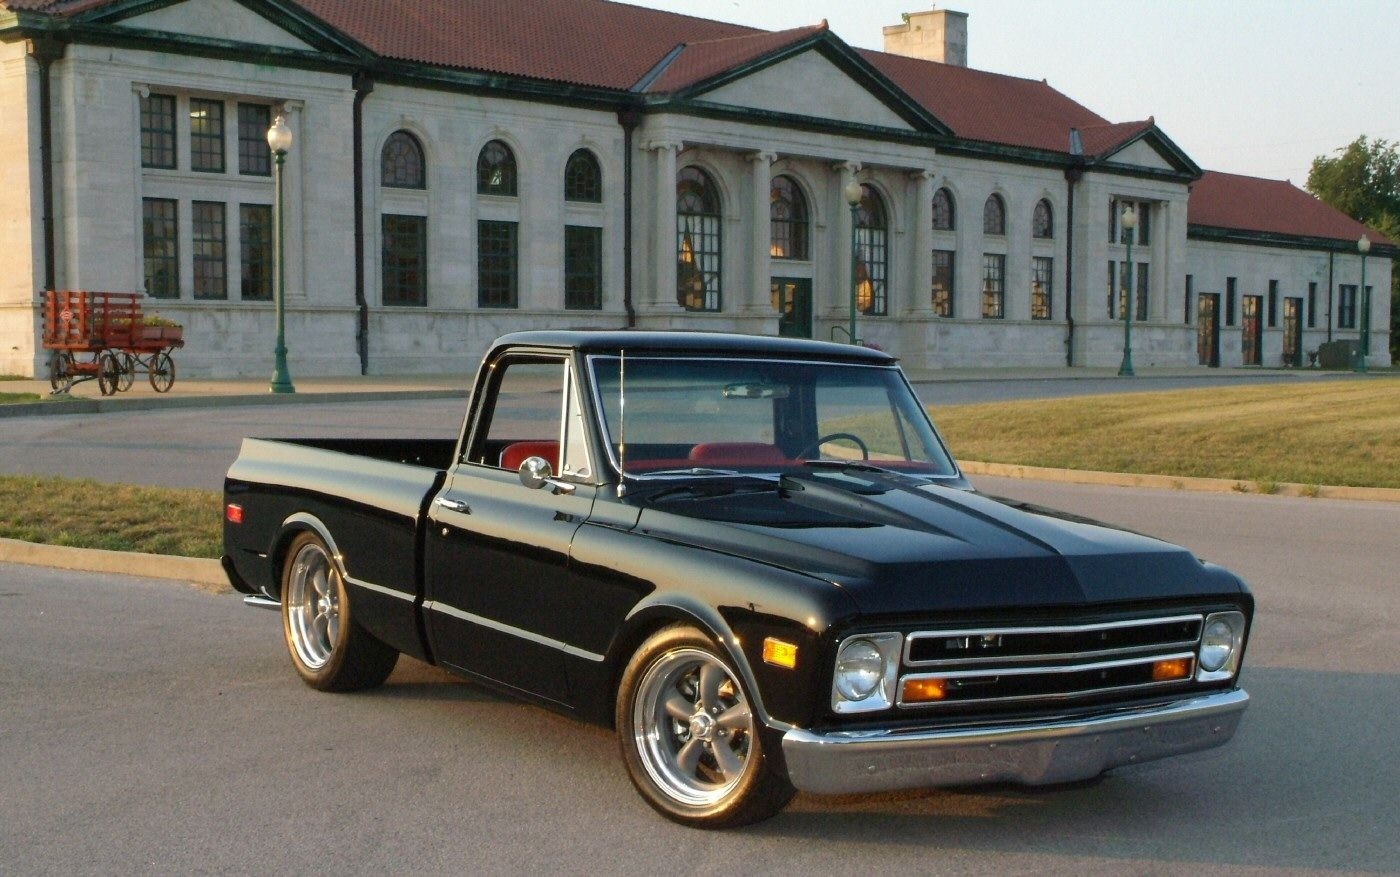 72 chevy truck | ... 67-72 Chevrolet & GMC Pickup Trucks, Suburbans